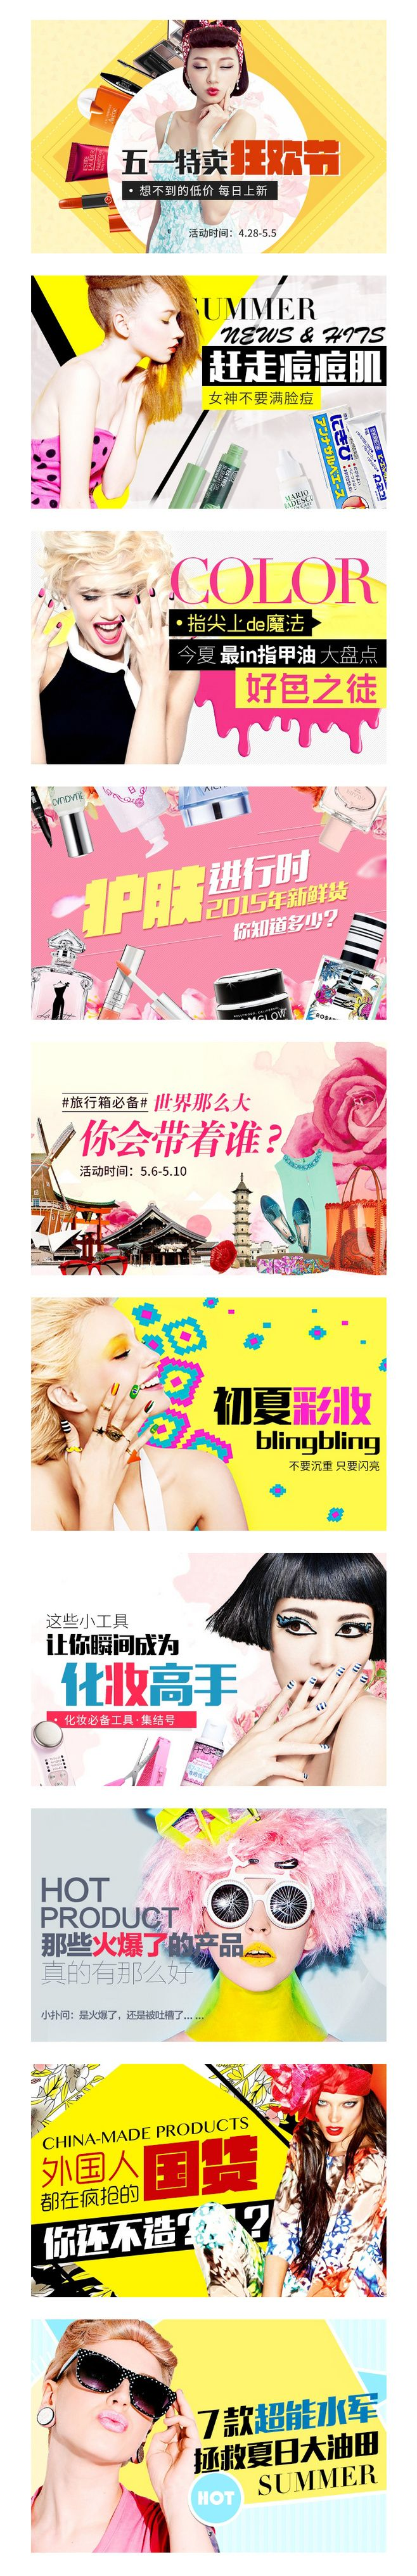 Banner海报图6 美妆化妆品 护肤类 #banner #web#design